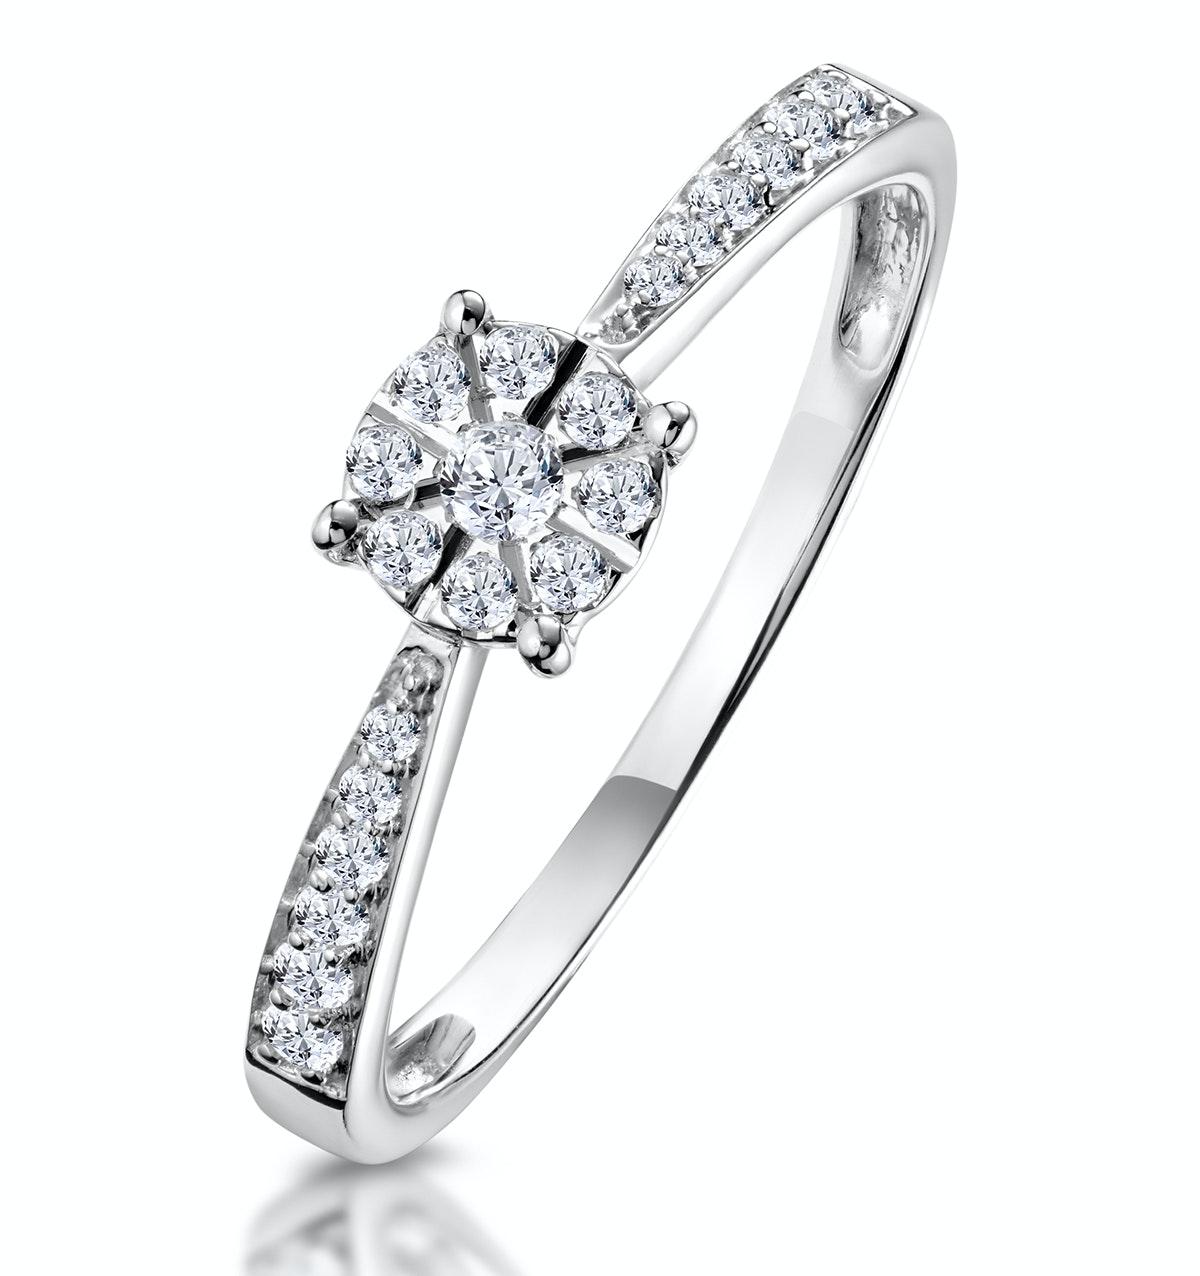 Masami Diamond Engagement Ring 0.20ct Pave Set in 9K White Gold